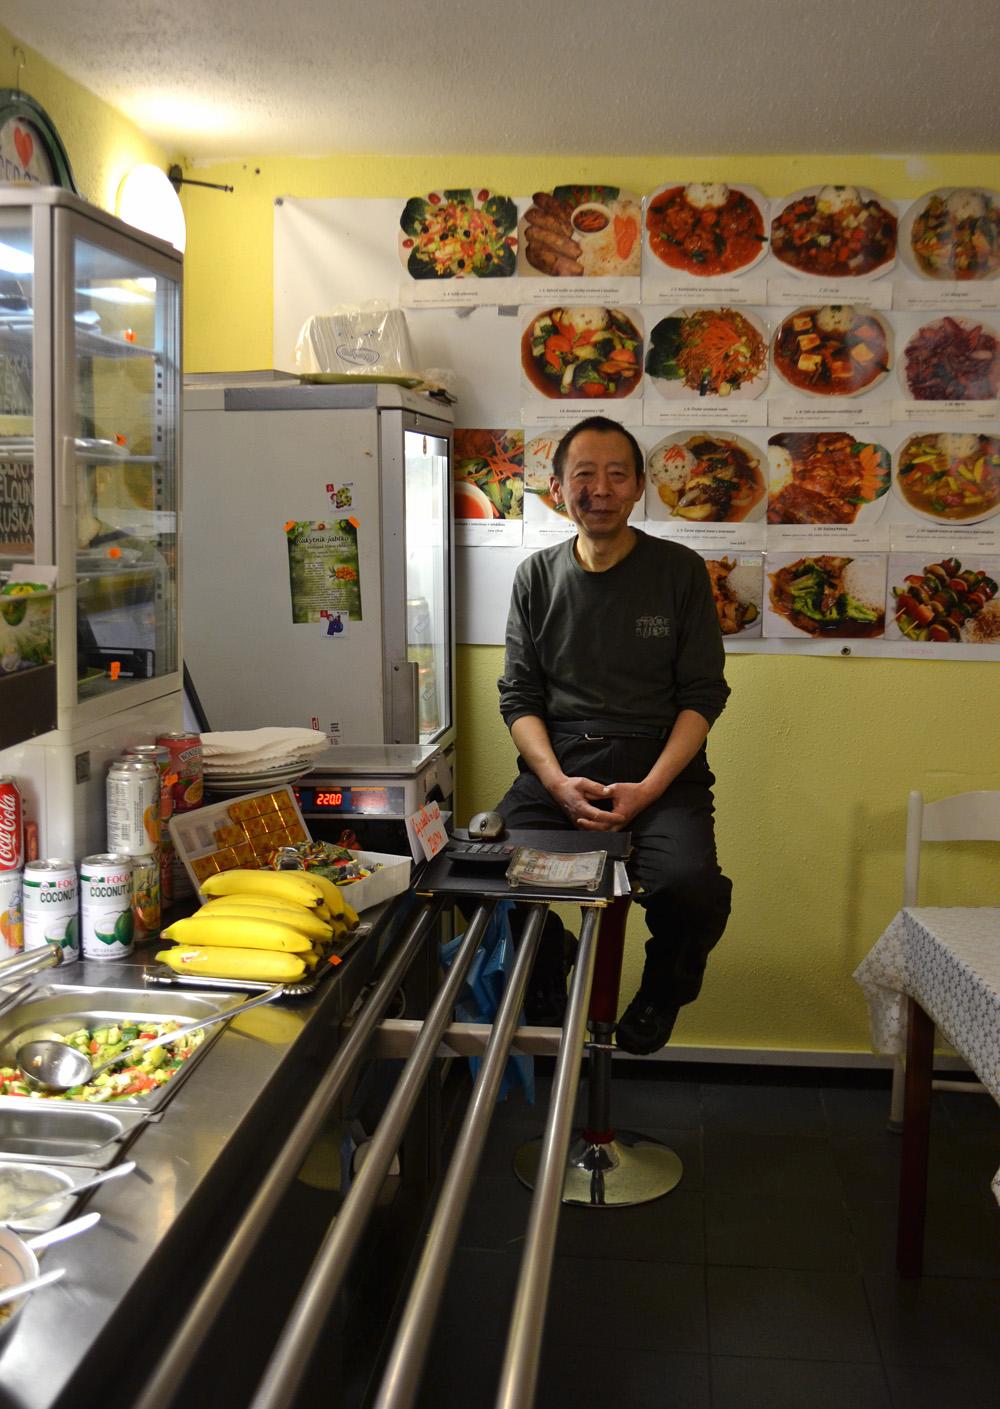 Jian Guo Chen in his vegan restaurant Vegetka. Photo: Barbora Sajmovicova, 2016, Prague.